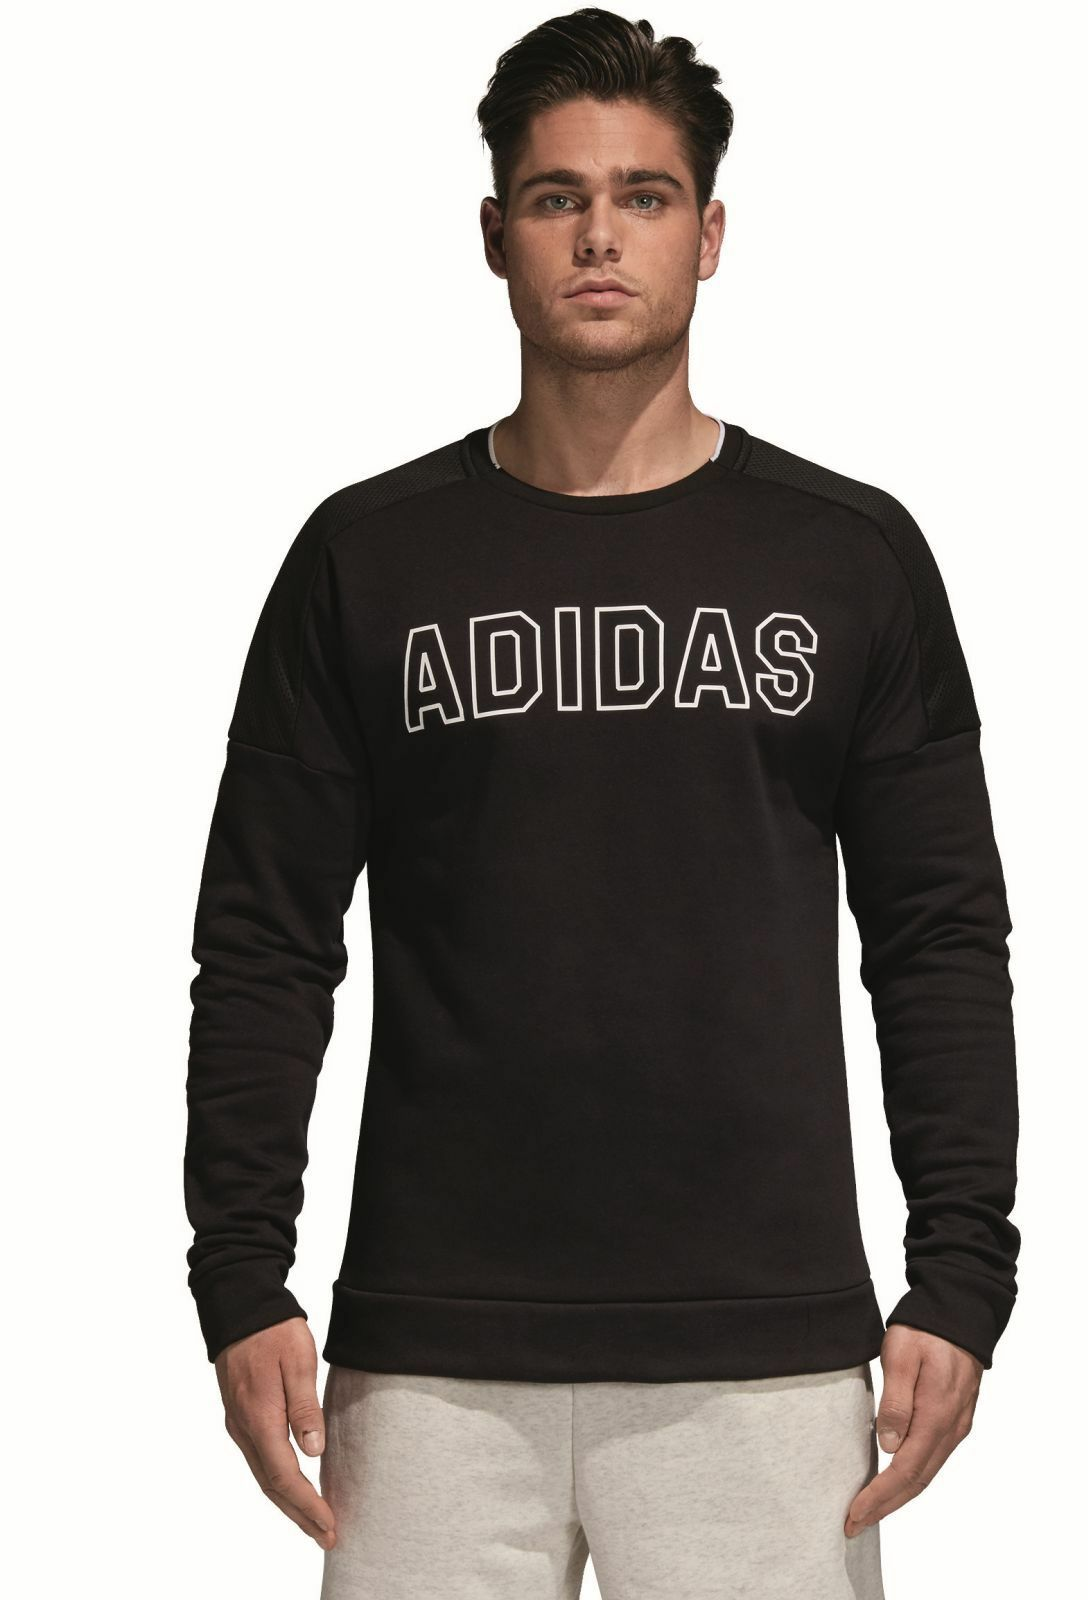 Adidas Performance Sport Uomo Tempo Libero Sport Id Sweatshirt Pile Nero